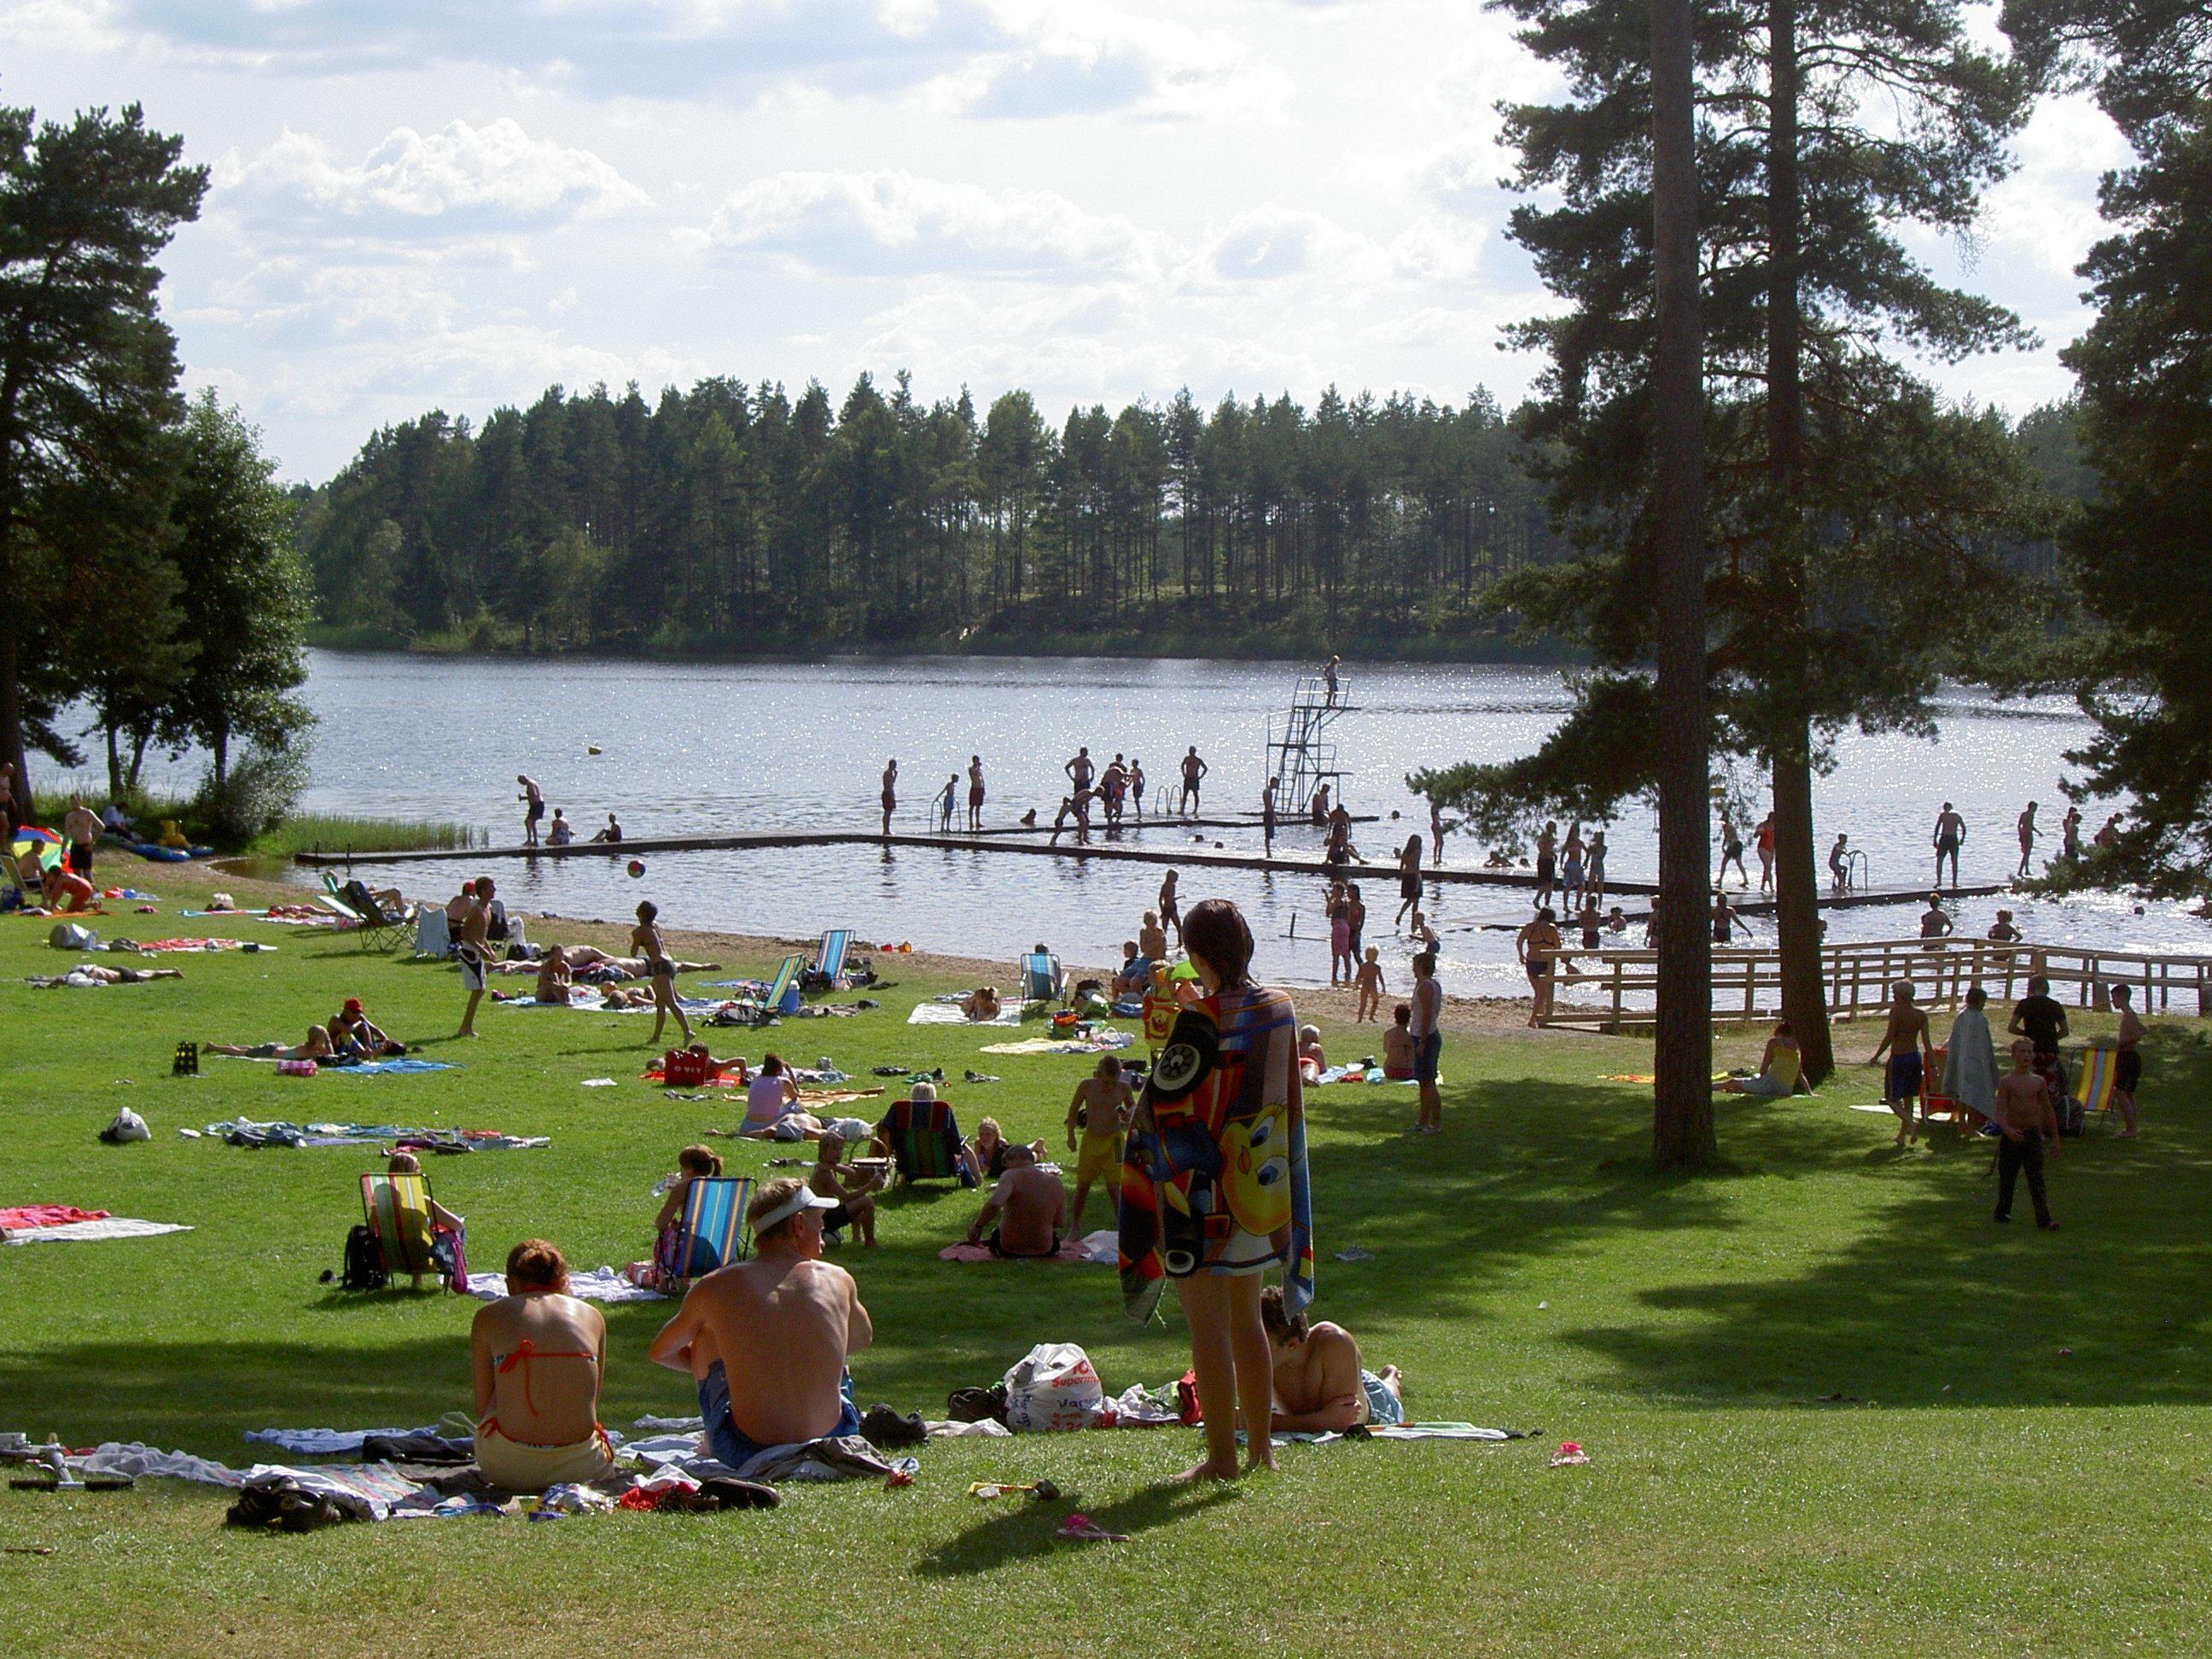 Swim in Hjortsjön, Vaggeryd's municipality